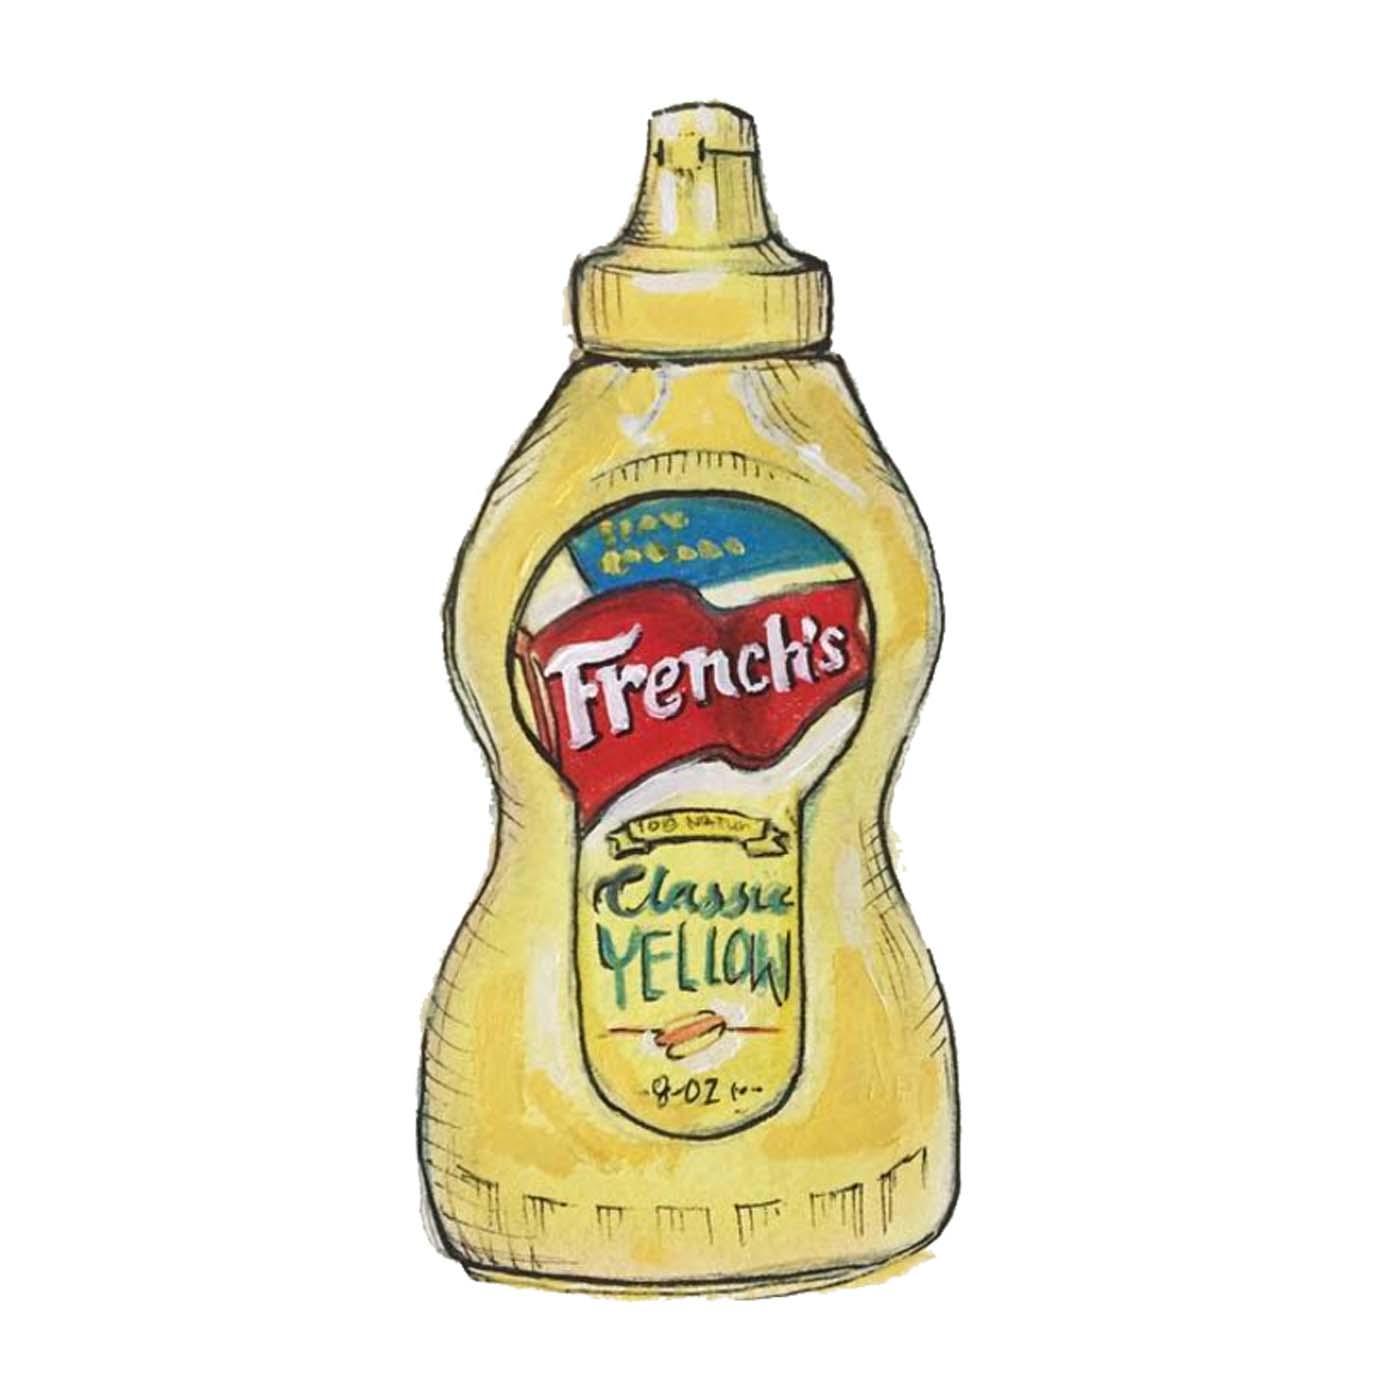 COndimental_Yellow_Mustard.jpg